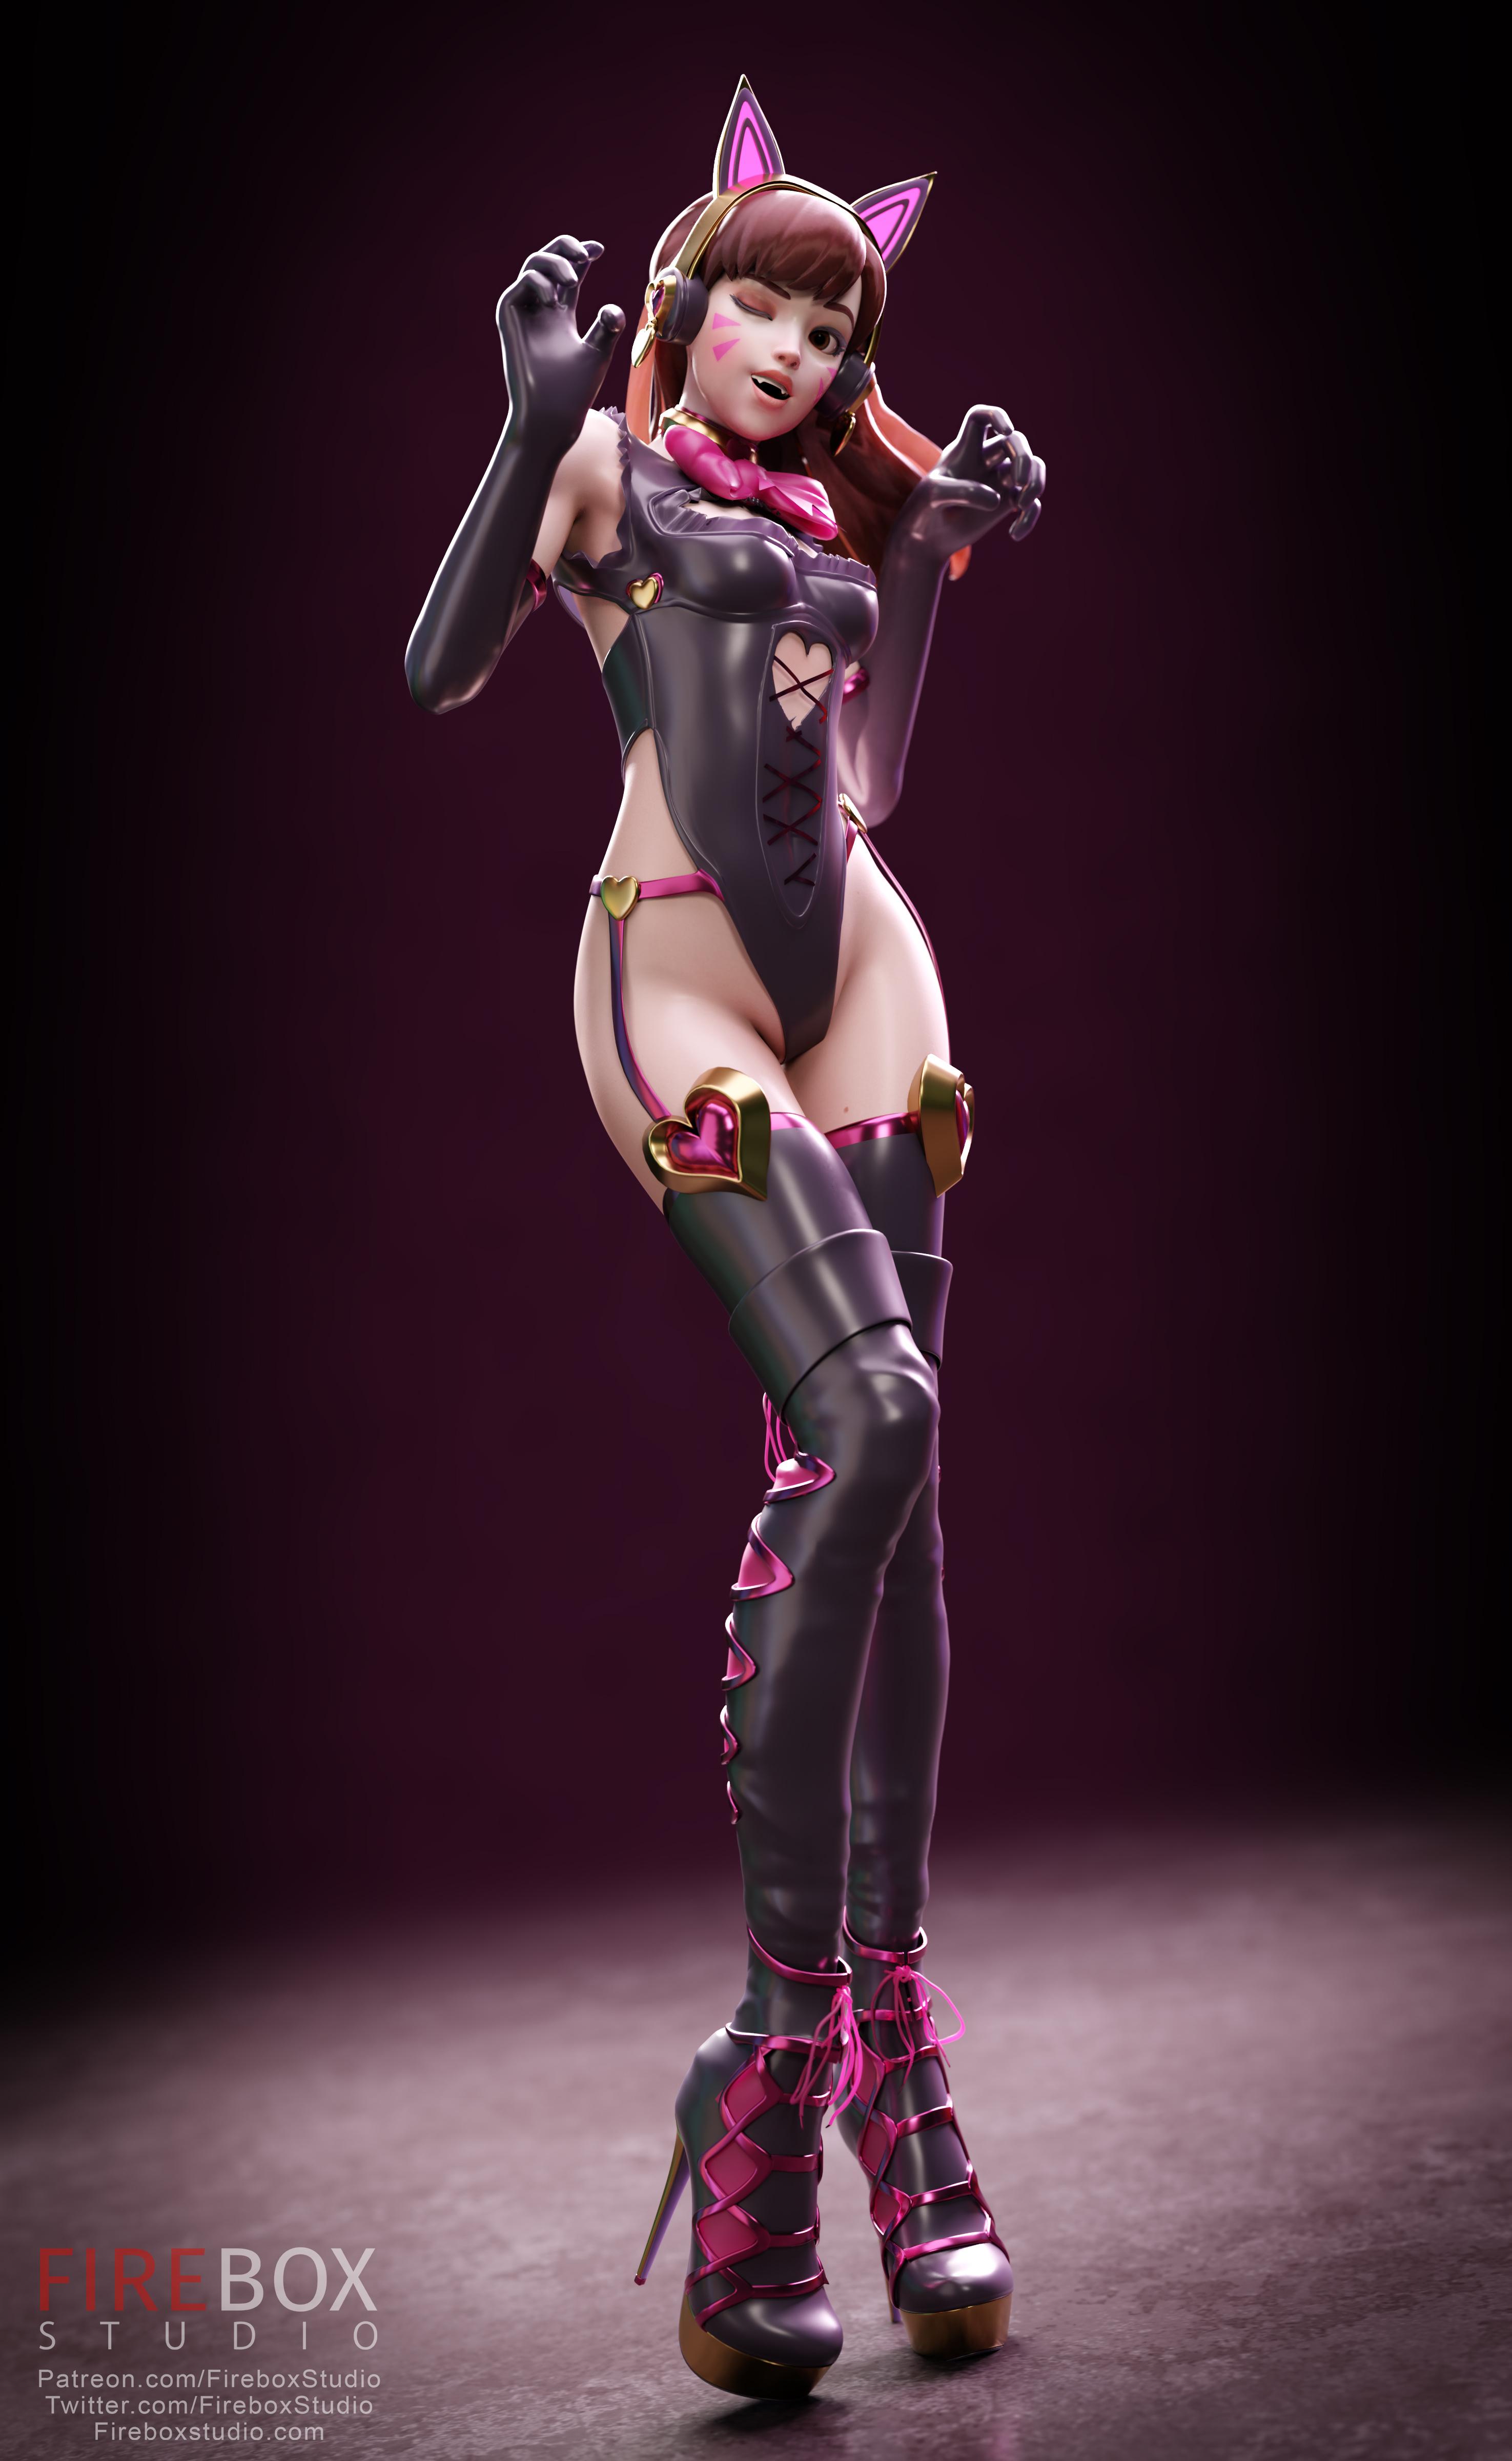 General 2950x4800 video games video game girls video game characters fantasy girl illustration artwork 3D Overwatch D.Va (Overwatch) catsuits Firebox Studio render